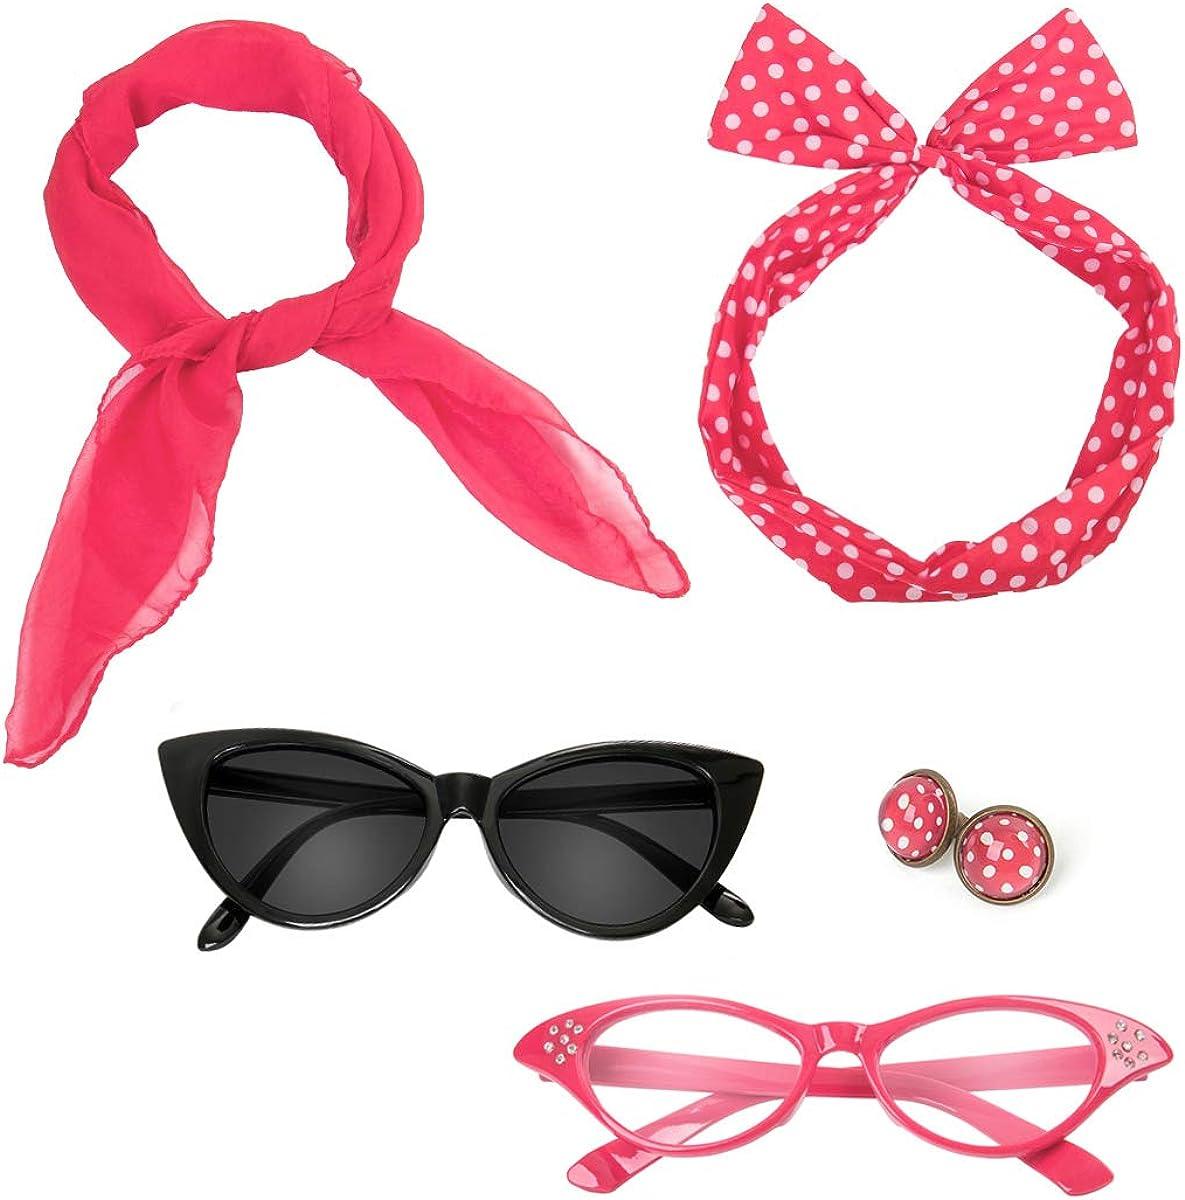 Retro 50's Costume Accessories Set Polka Dot Chiffon Scarf Cat Eye Glasses Bandana Tie Headband & Earrings